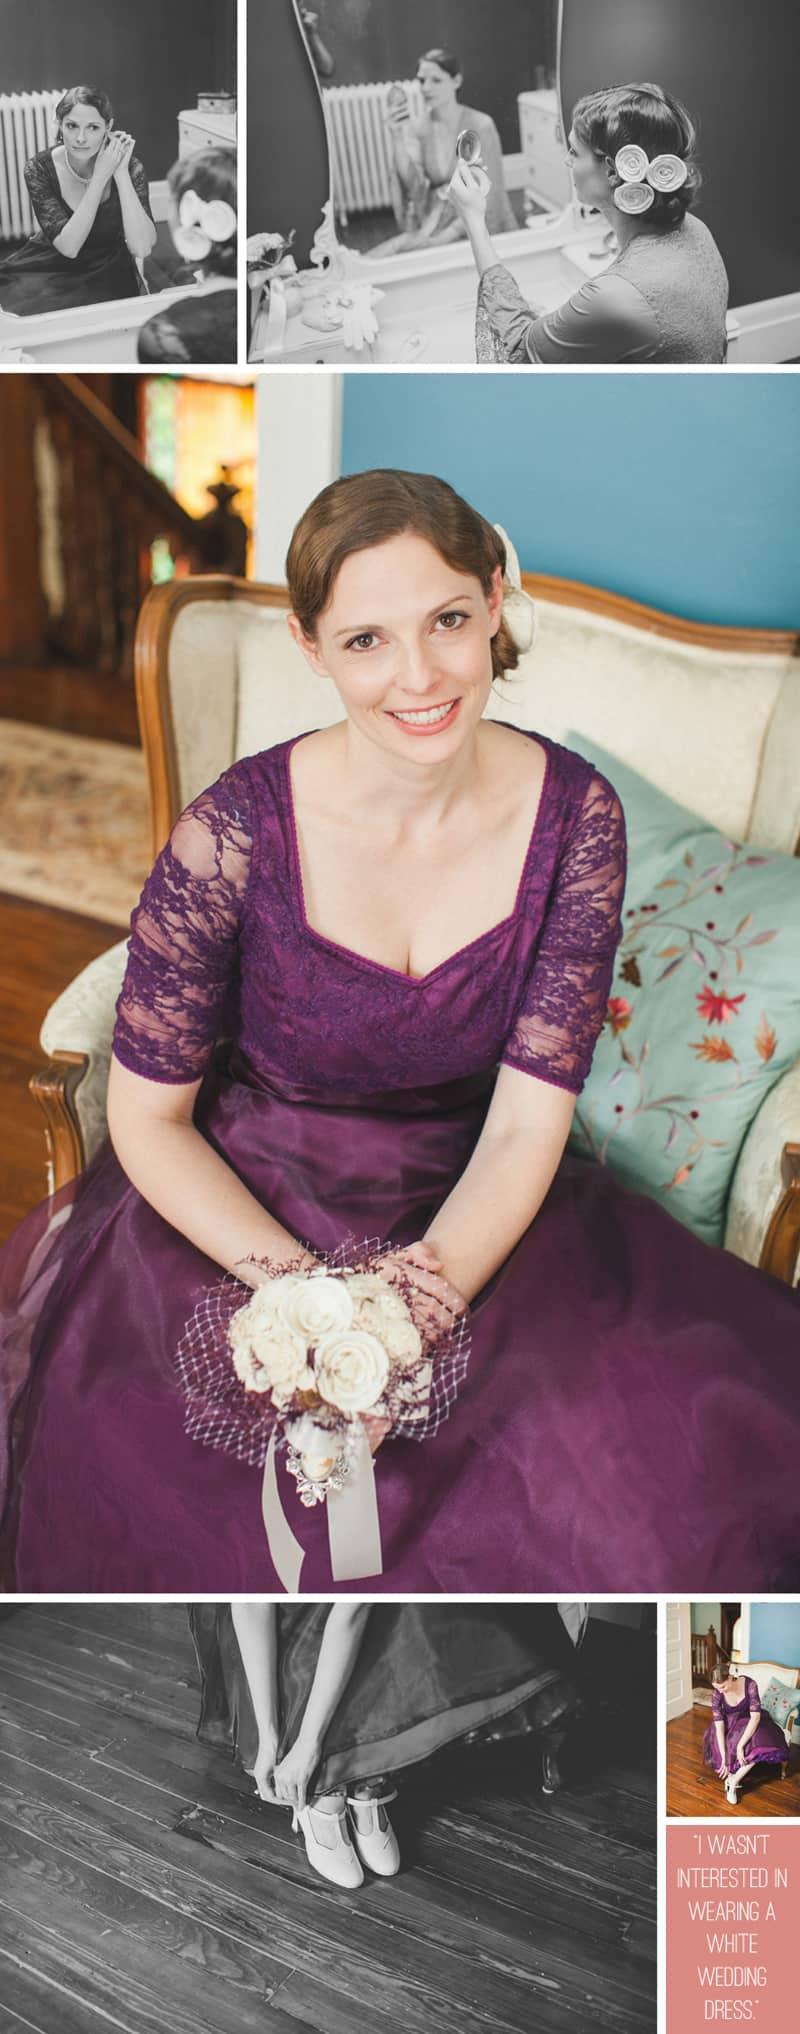 A Purple Wedding Dress For a Backyard Wedding 4